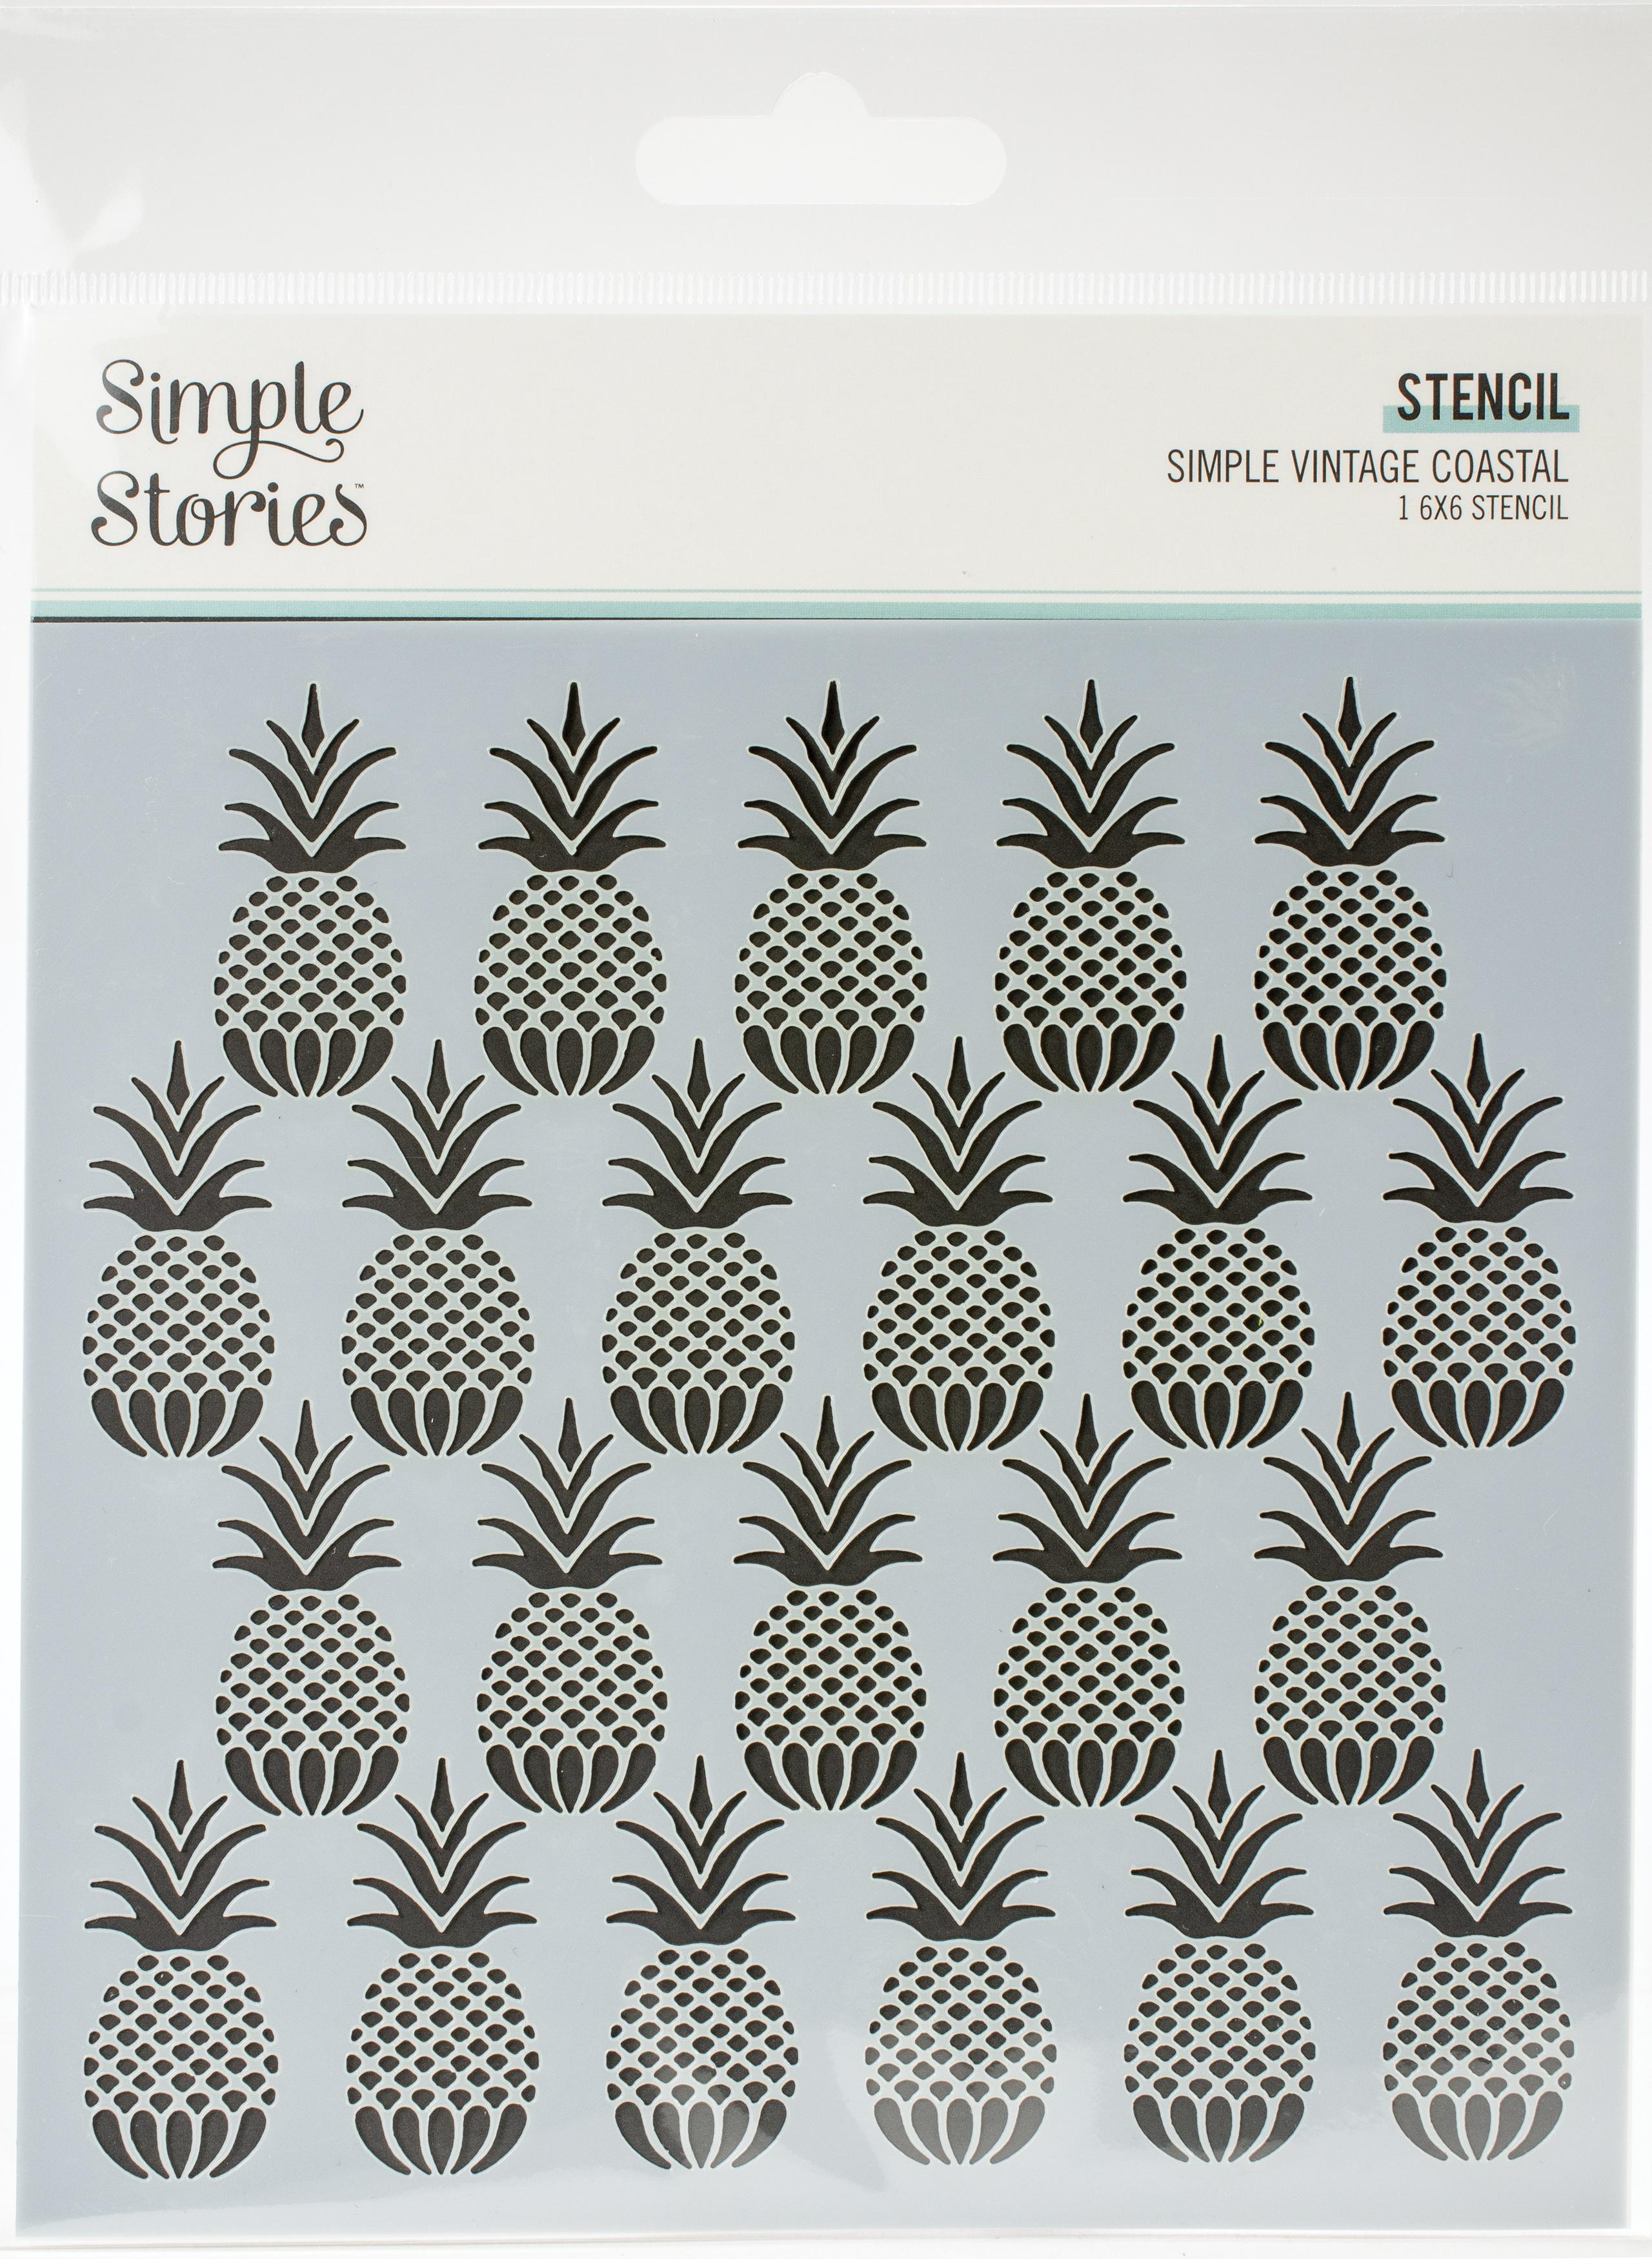 Simple Vintage Coastal Stencil 6X6-Pineapples